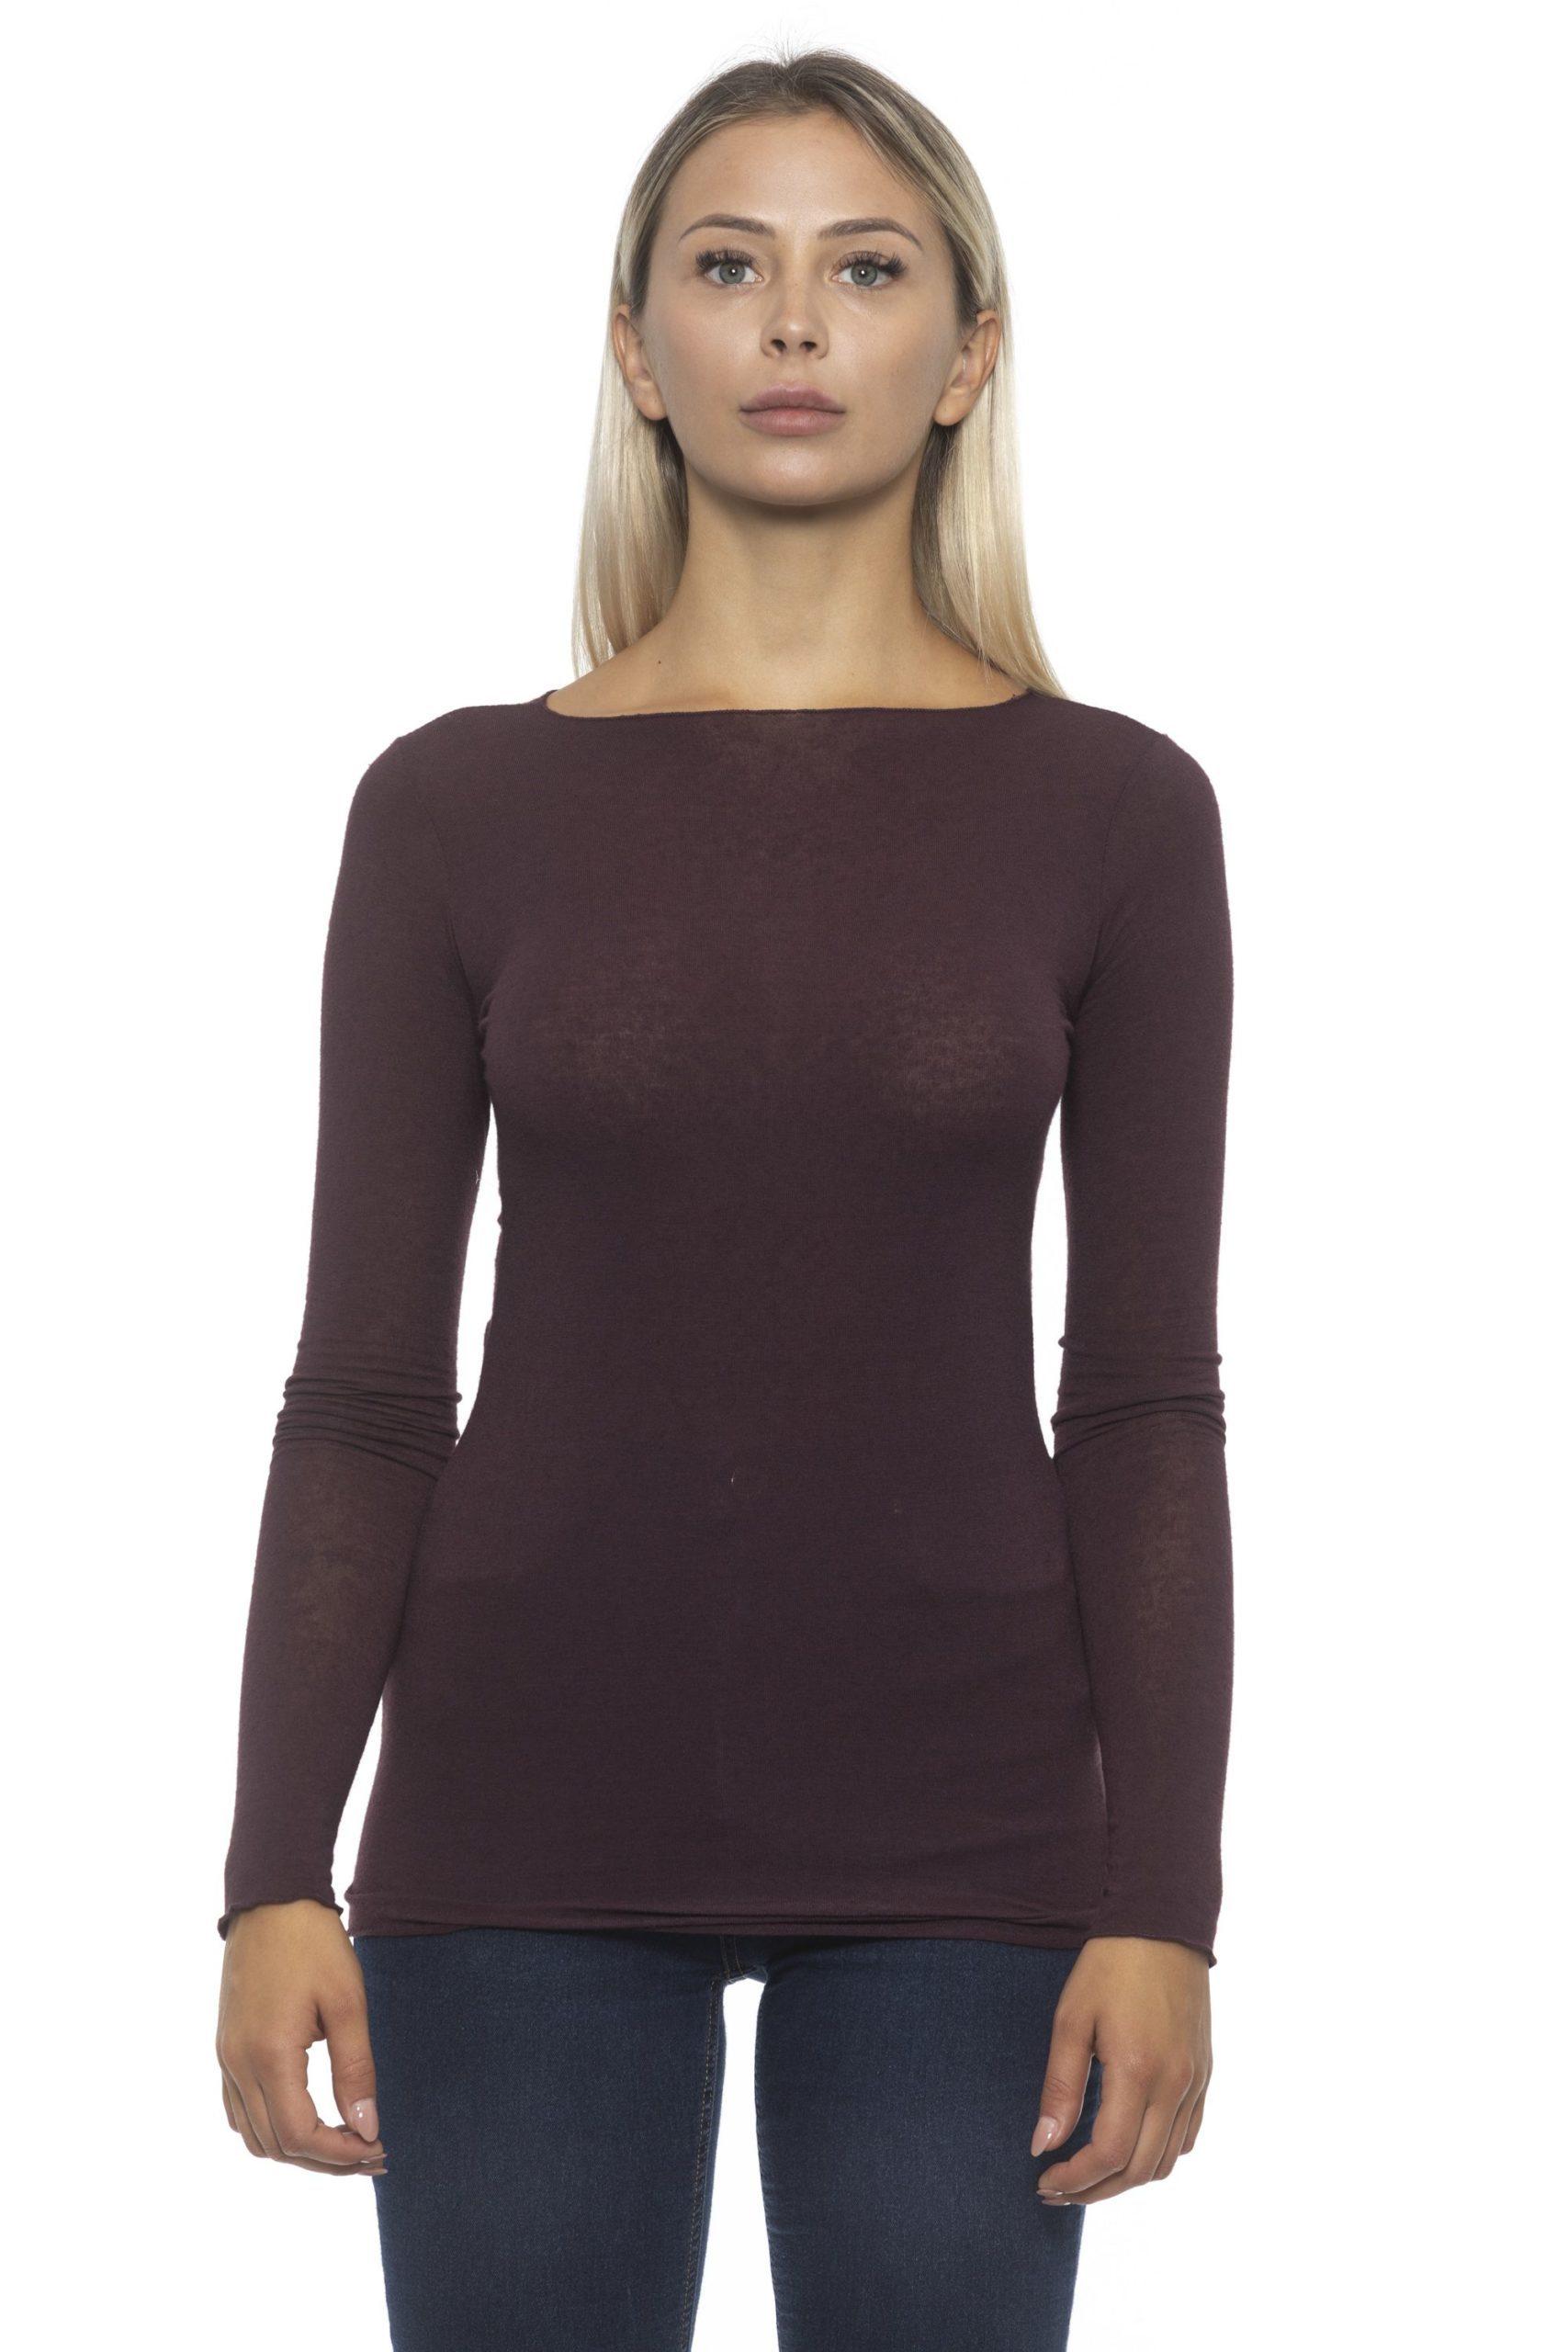 Alpha Studio Women's Mosto Sweater Burgundy AL1192281 - IT40   XS